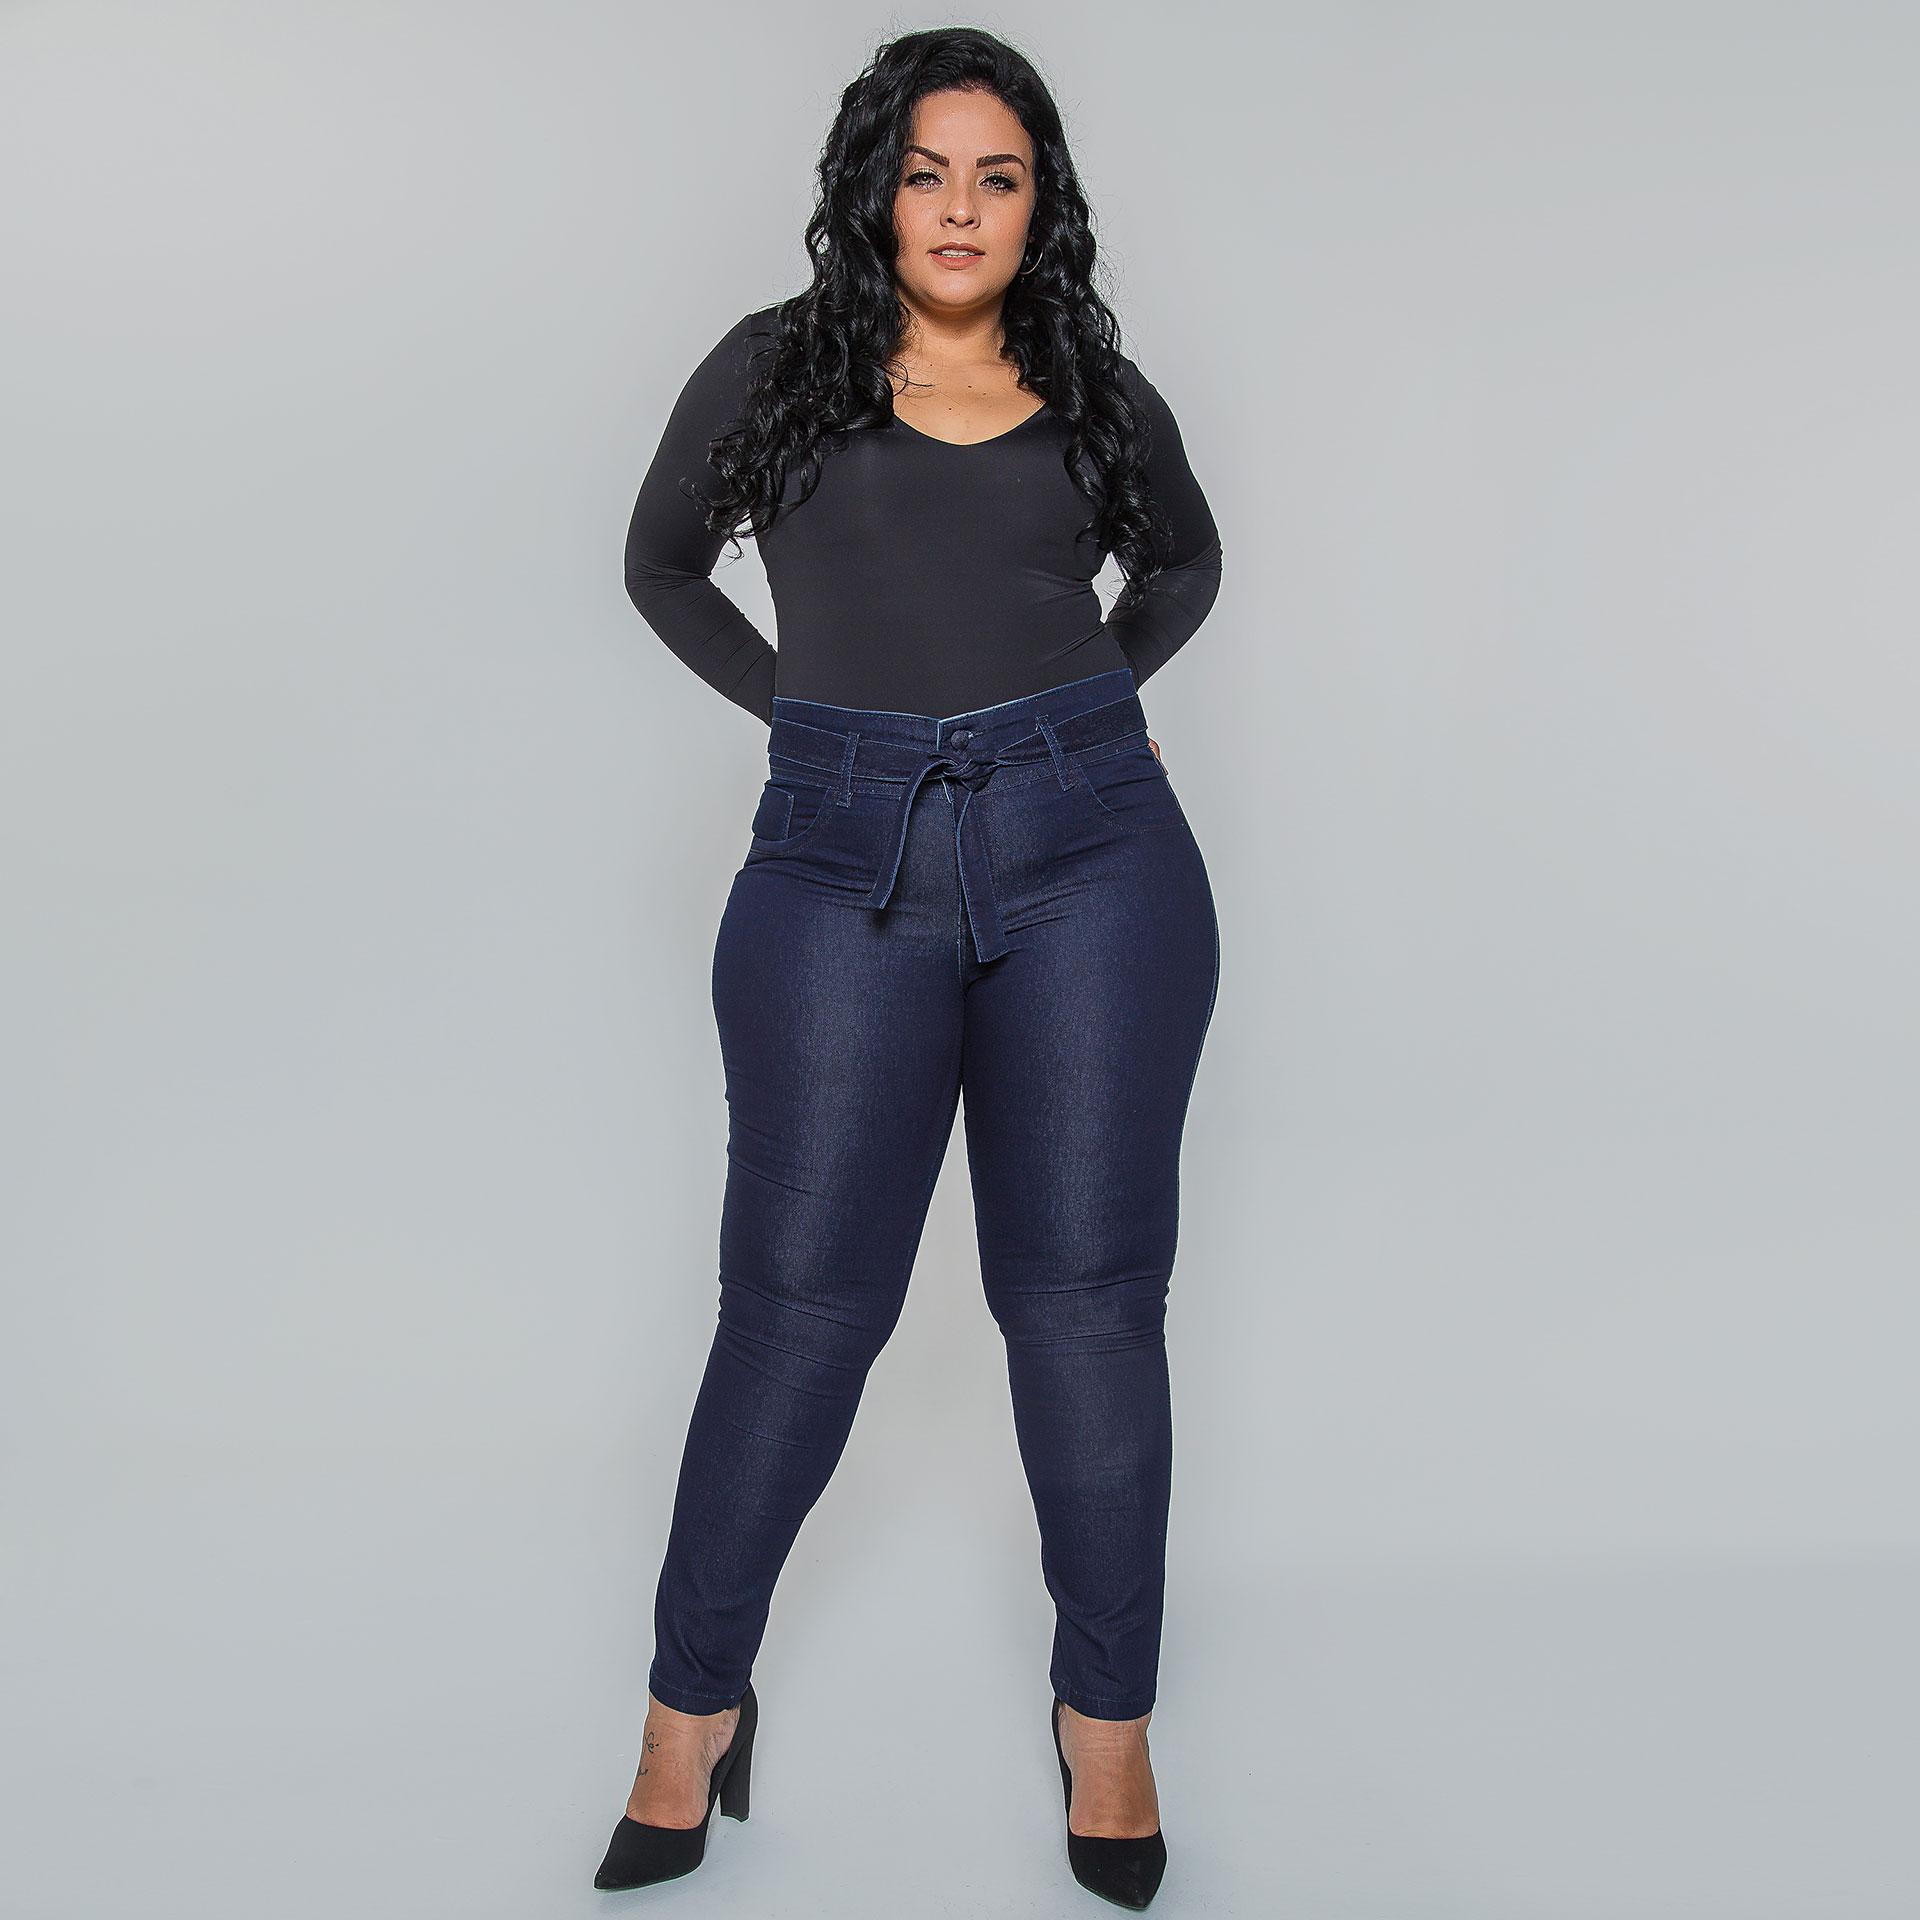 Calça Clochard Jeans Plus Size